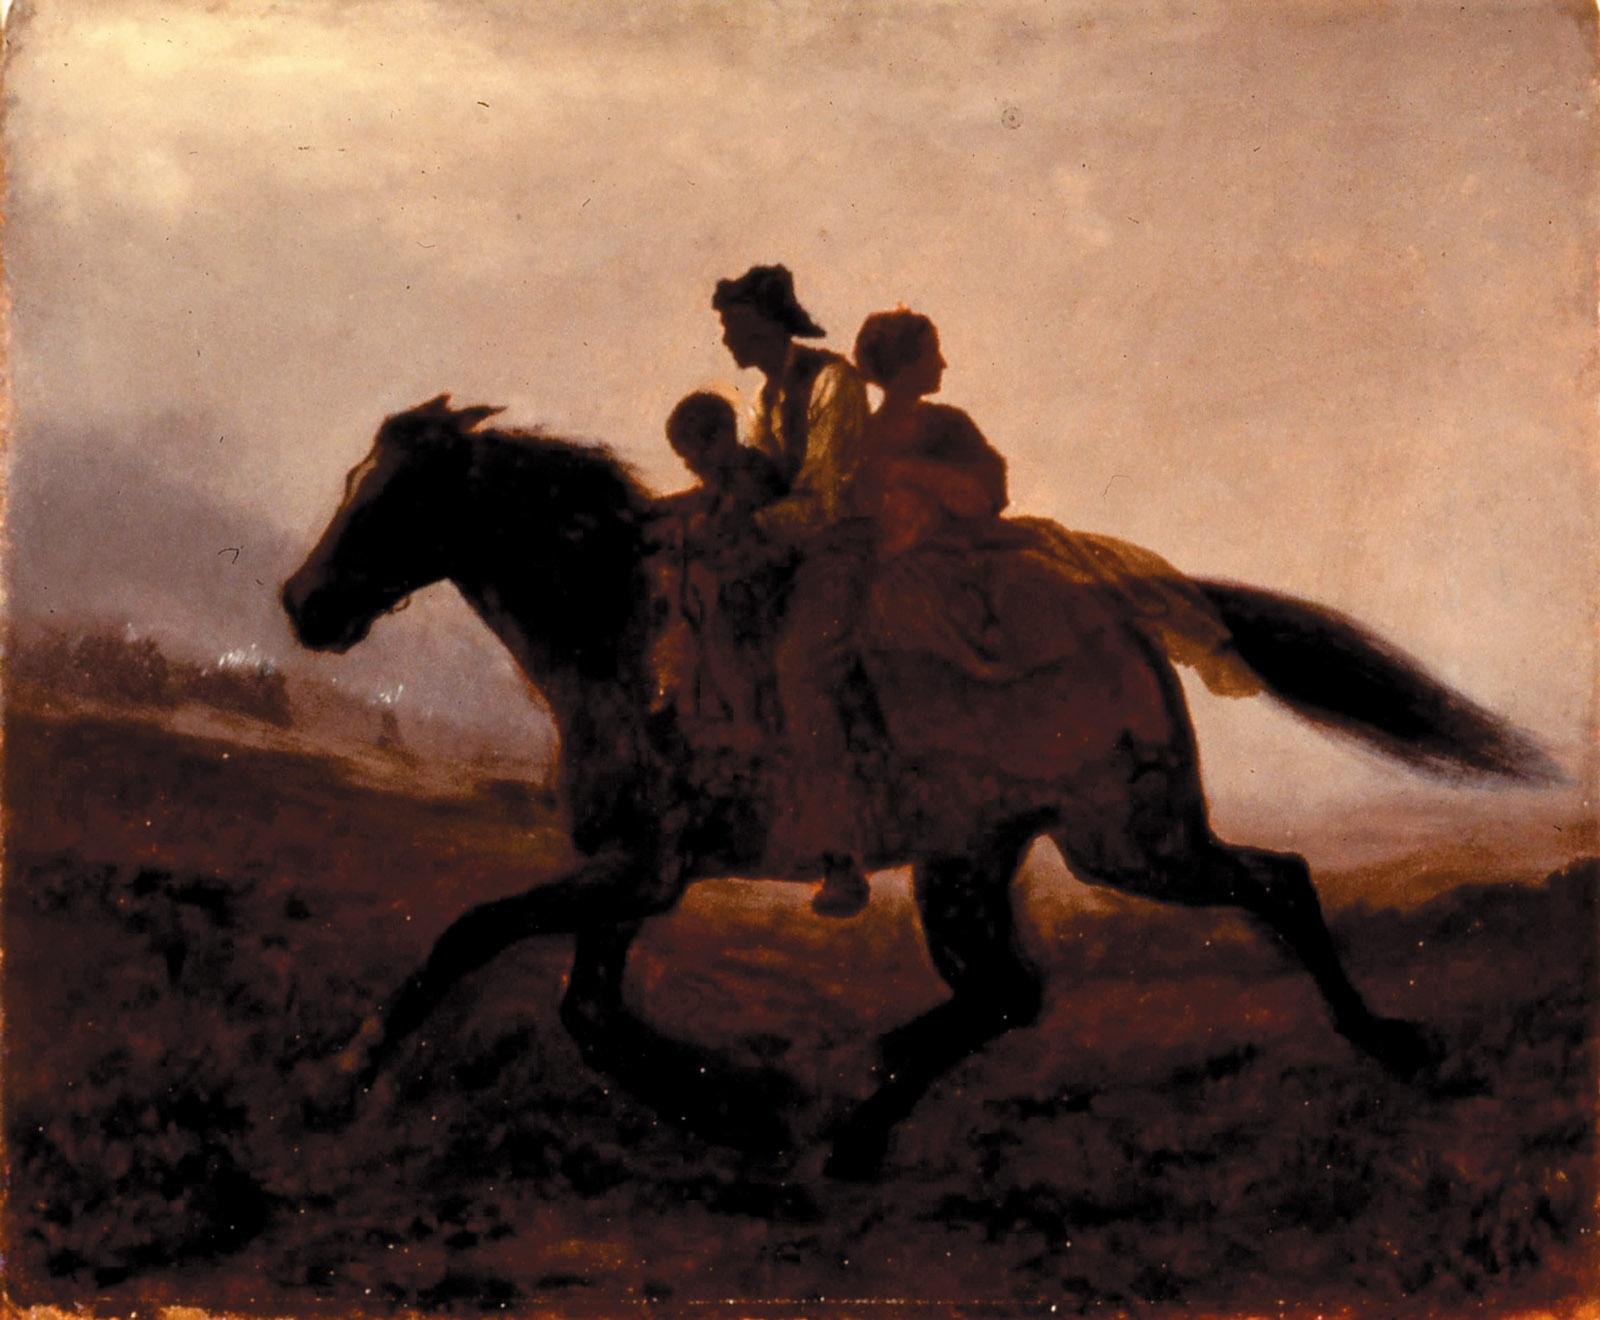 Eastman Johnson: A Ride for Liberty—The Fugitive Slaves, circa 1862